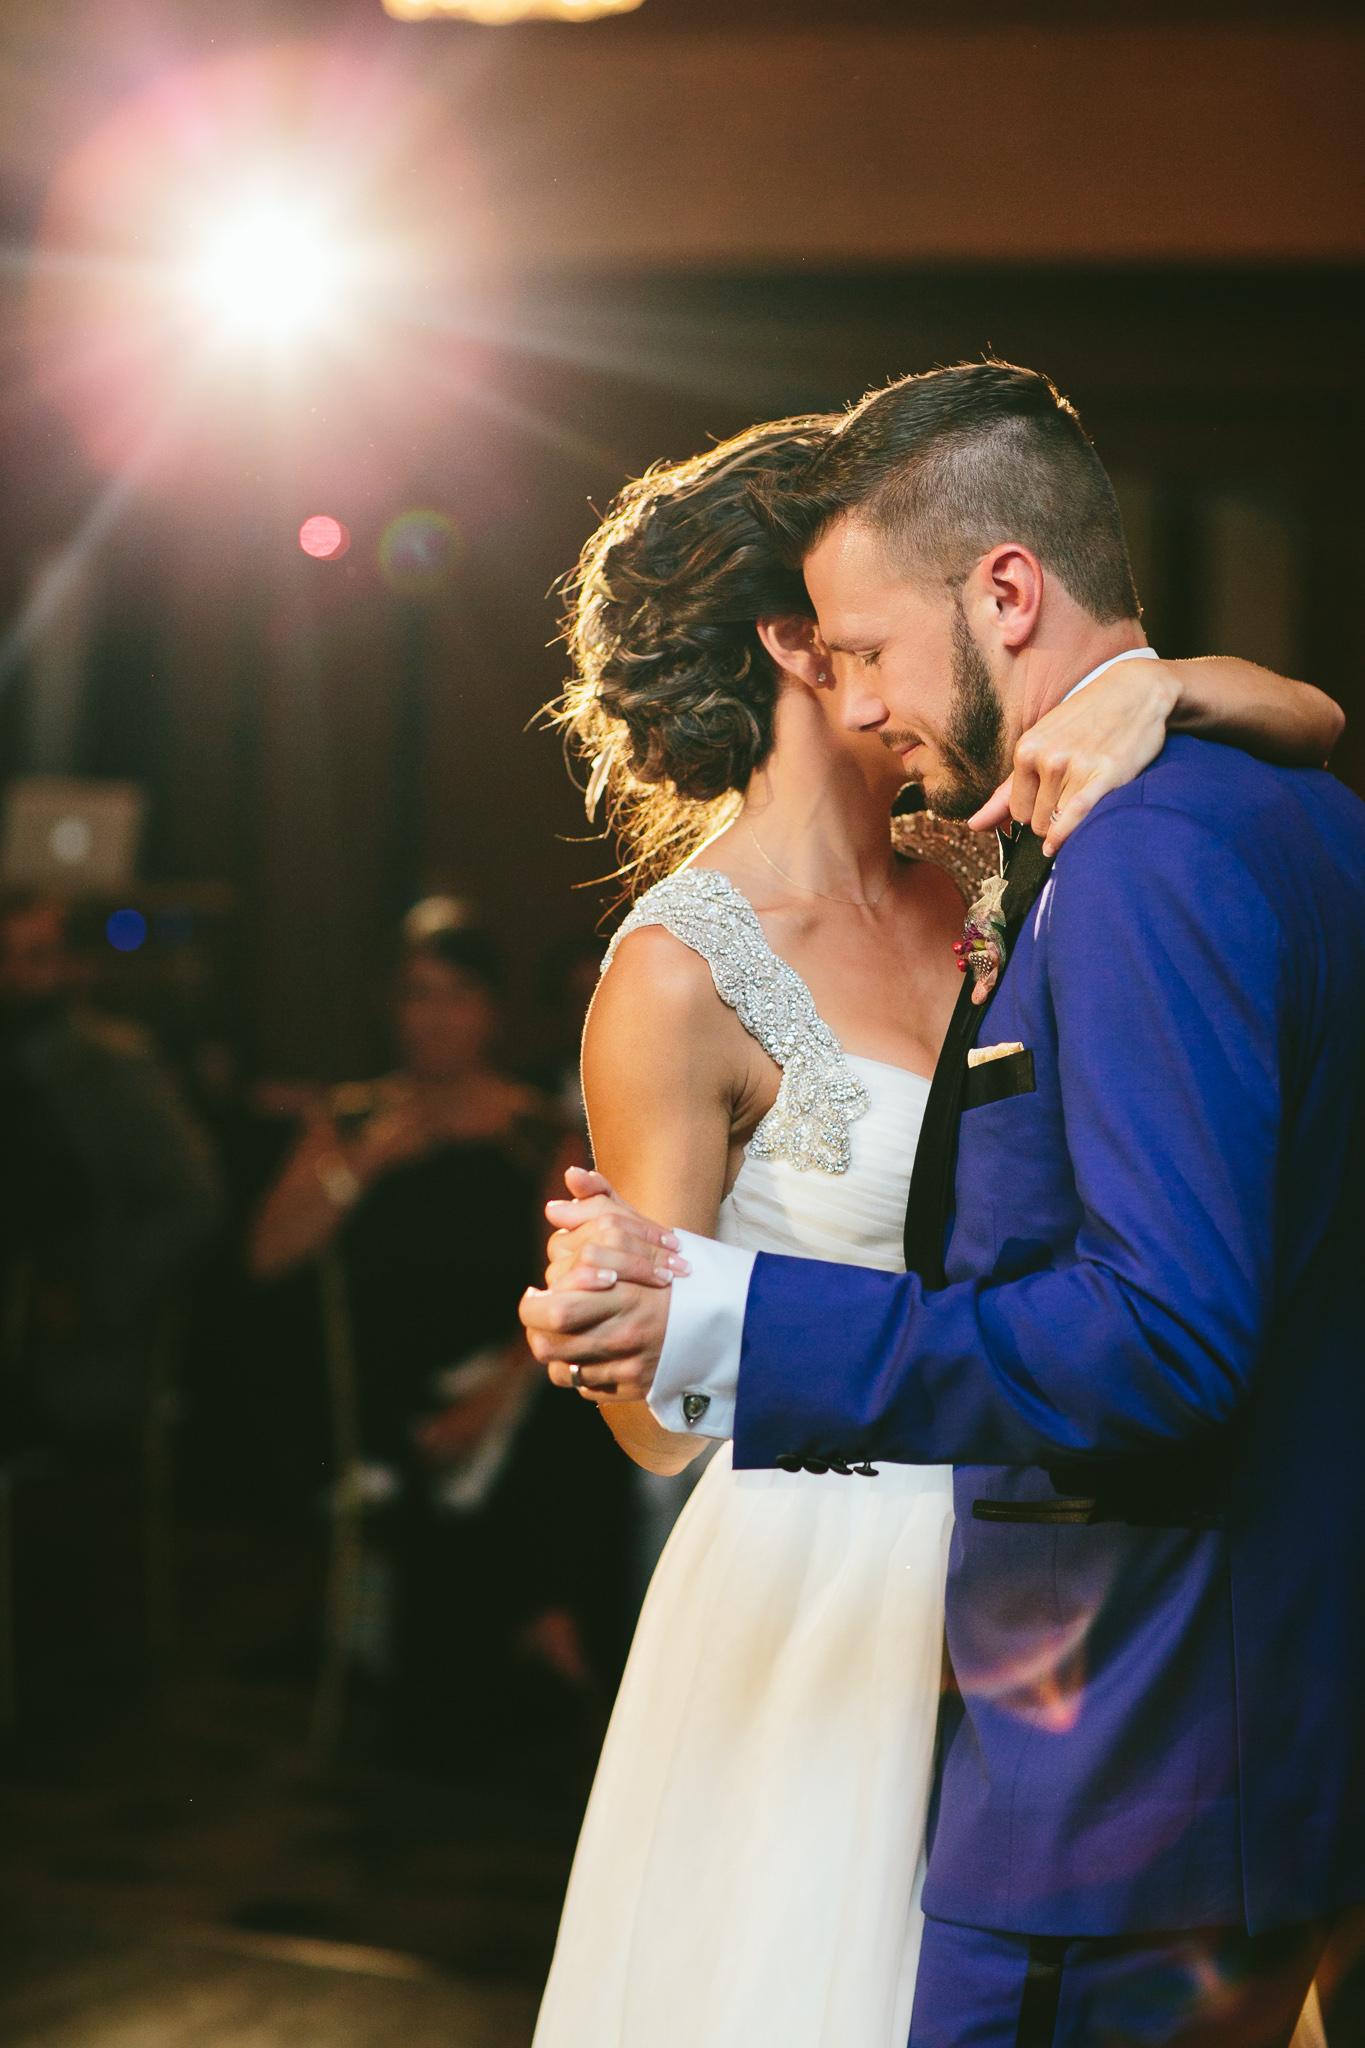 Brianna+Jeff-WEDDING_KellyBoitanoPhotography20151219_0151